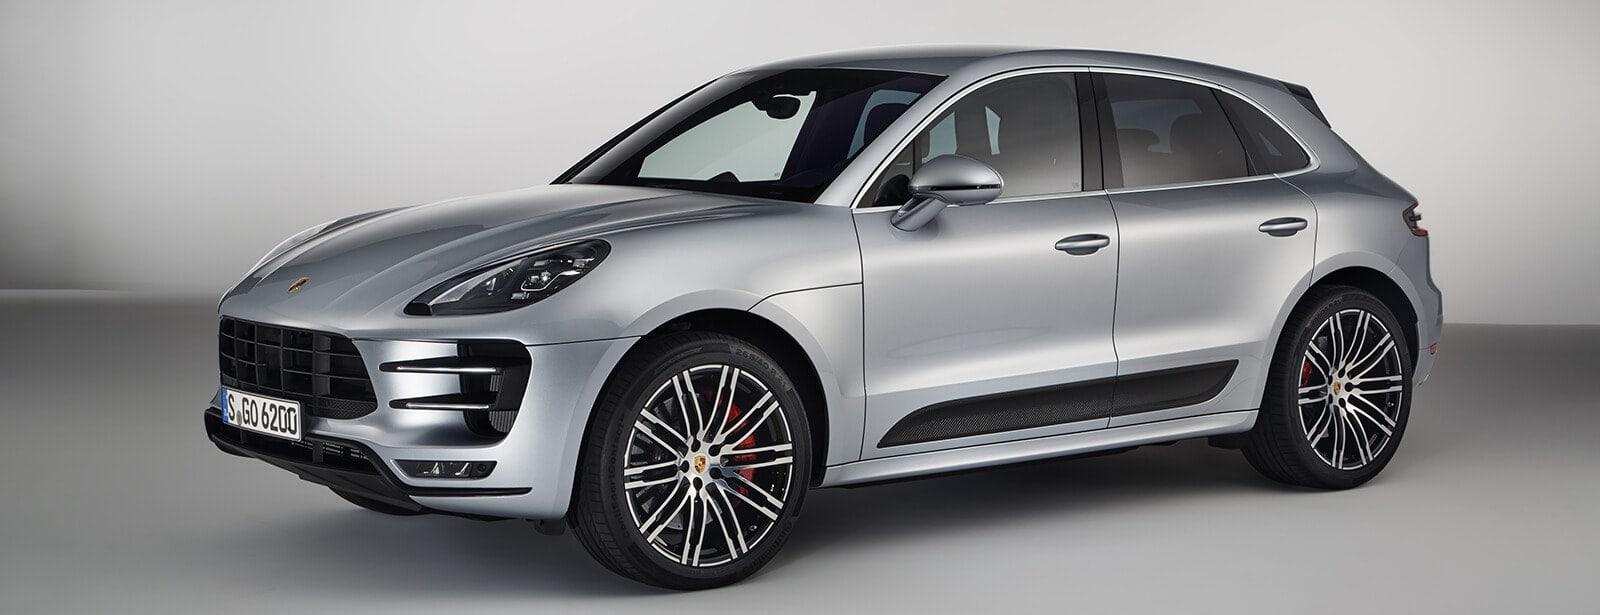 Porsche Macan Leasing